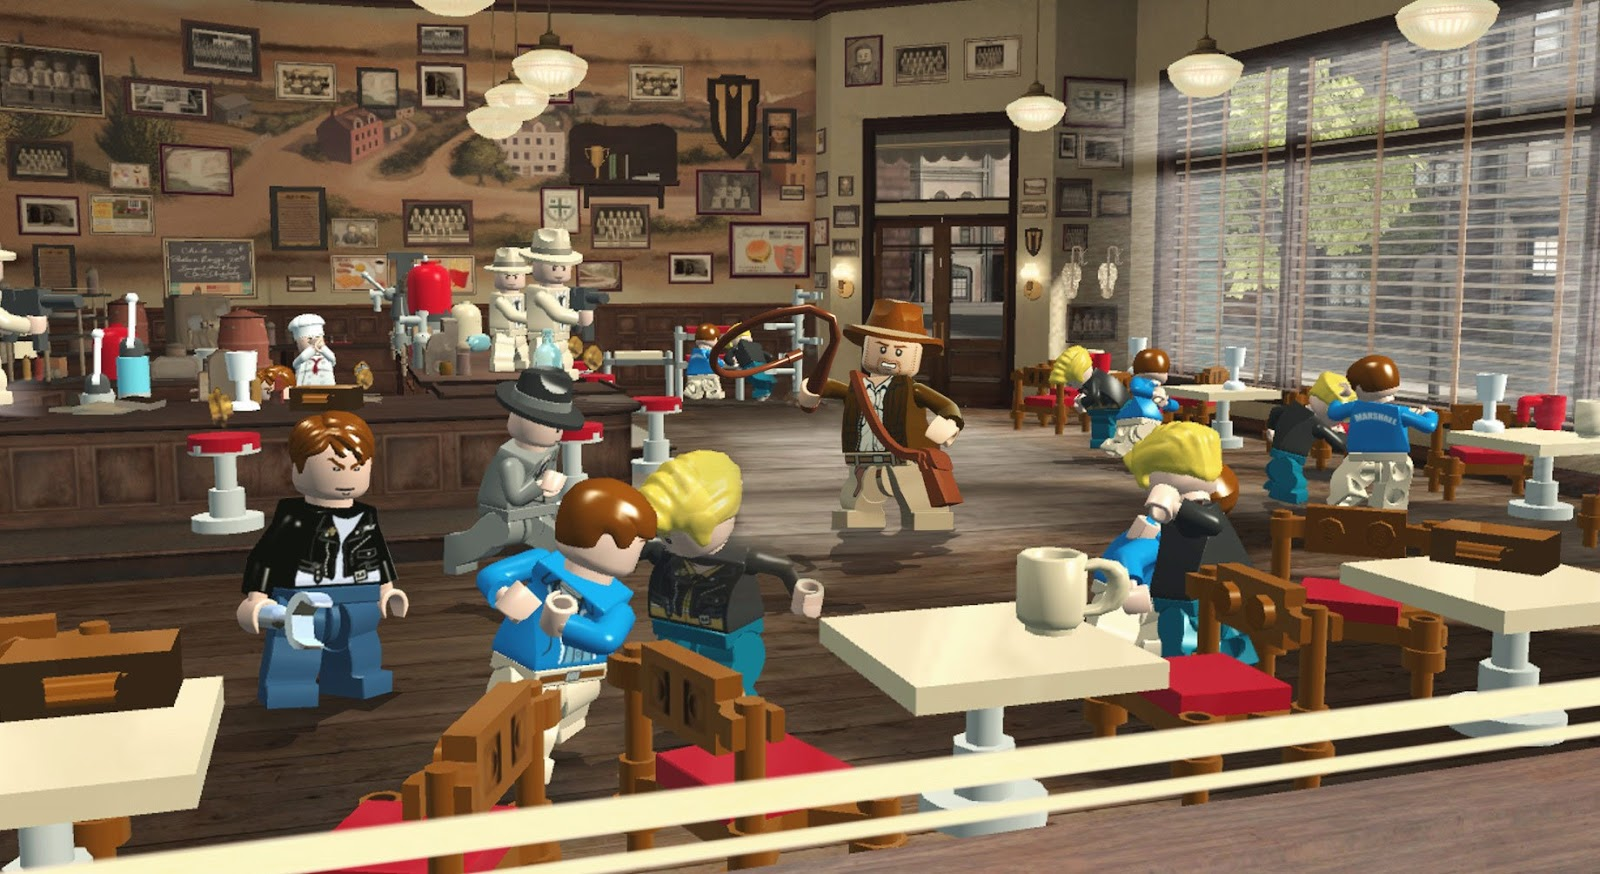 Indiana jones 2 online free games igt slots for sale